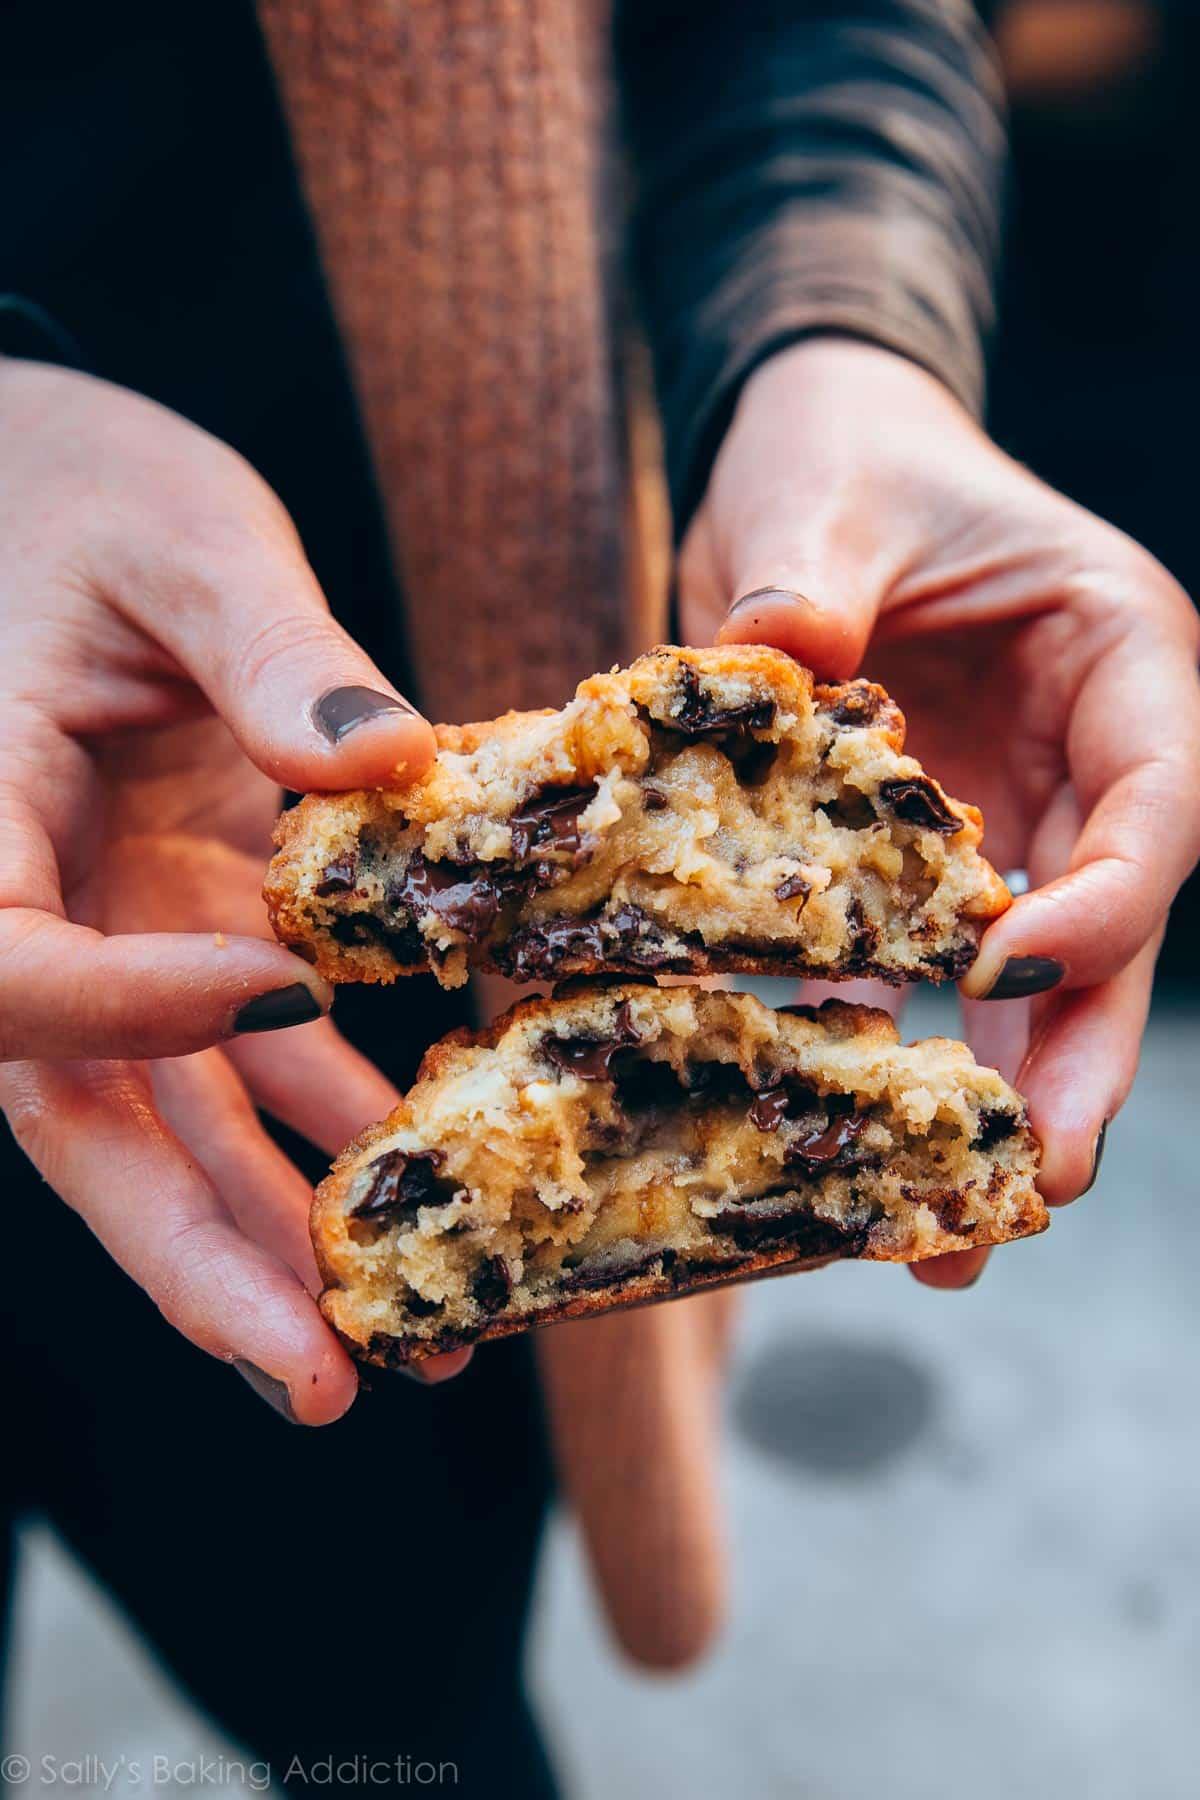 sallys-baking-addiction-nyc-bakery-tour-3